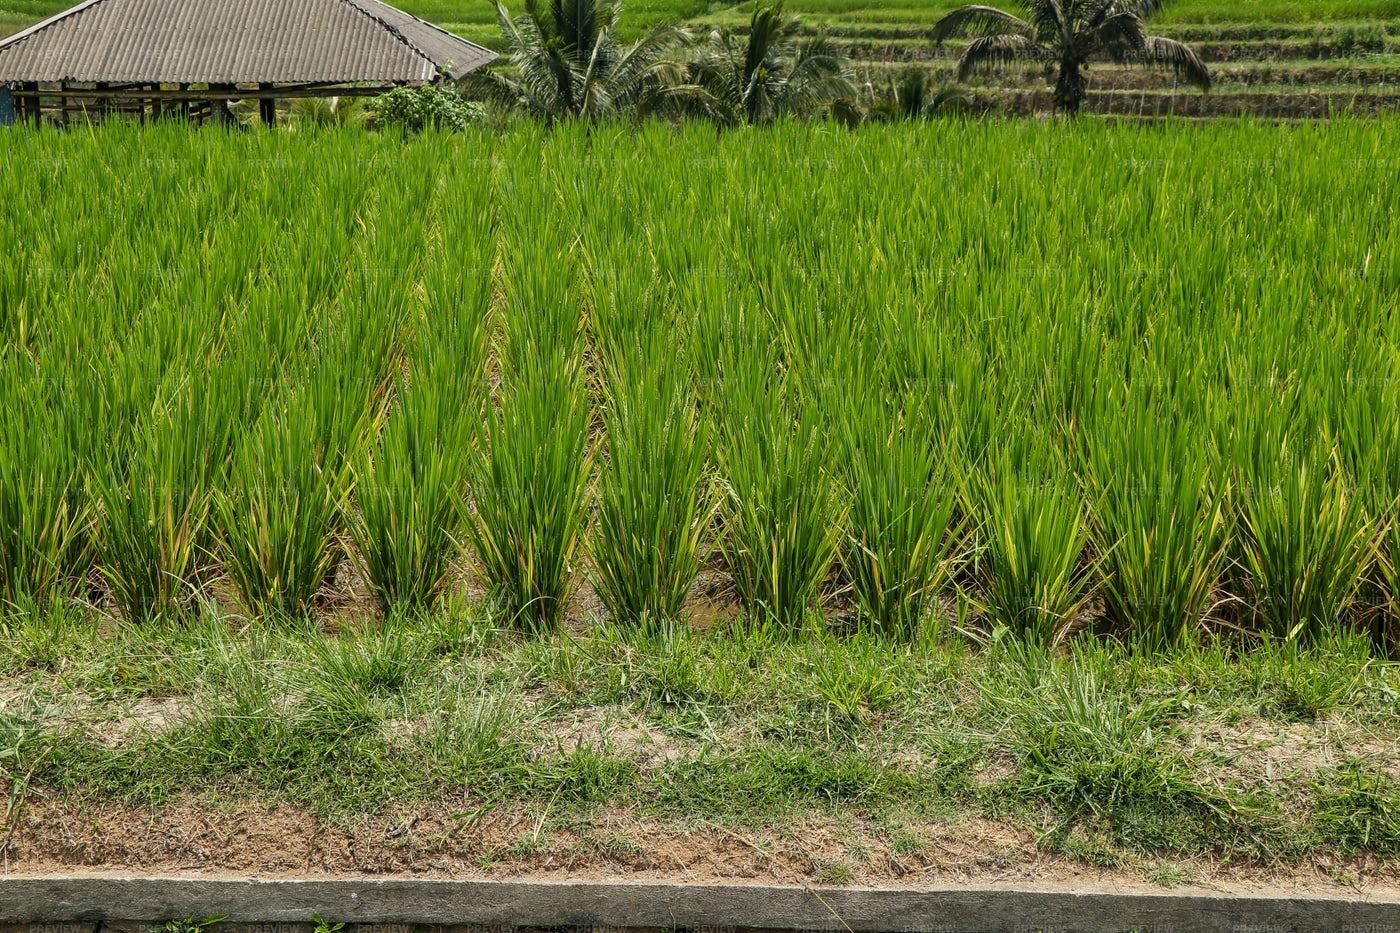 Growing Rice In Bali: Stock Photos